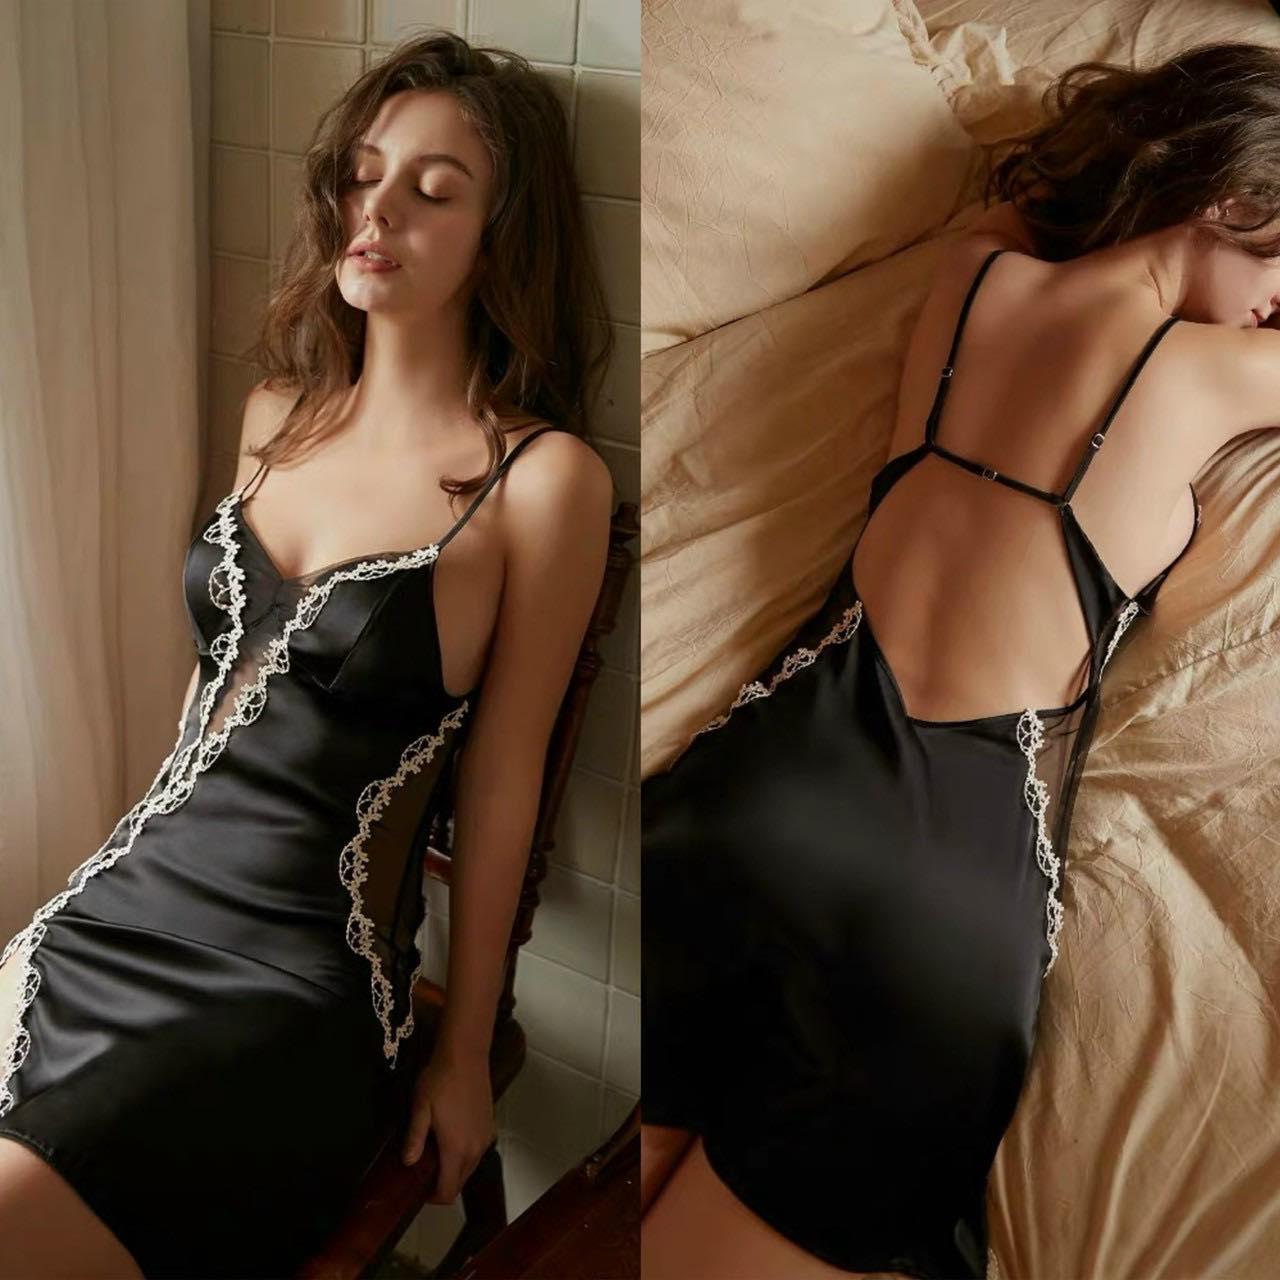 Váy Ngủ Dễ Thương TPHCM Blingerie